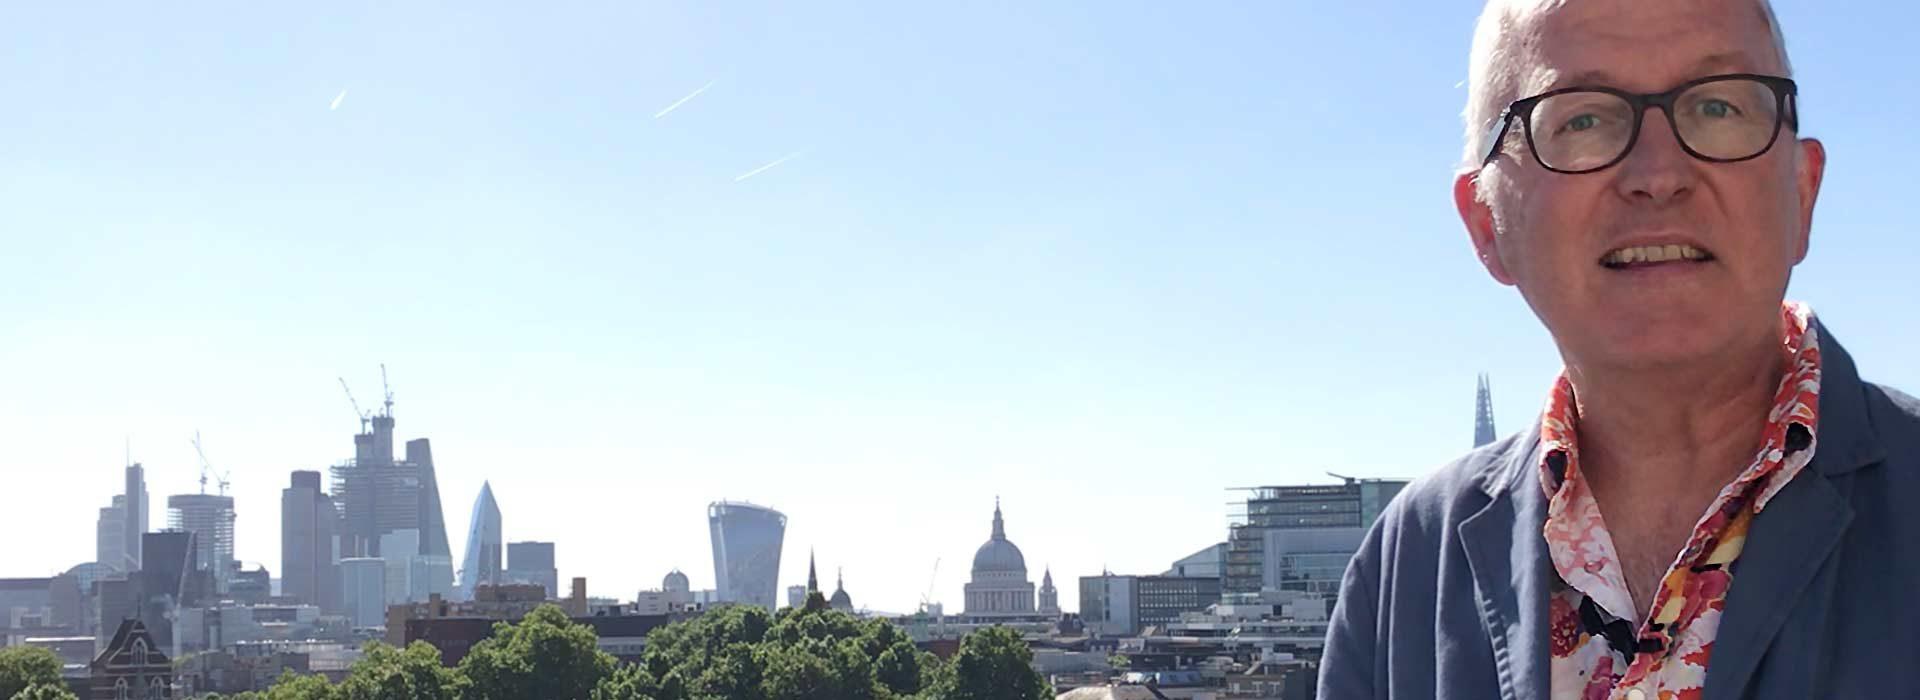 Chris Constantine against the London skyline